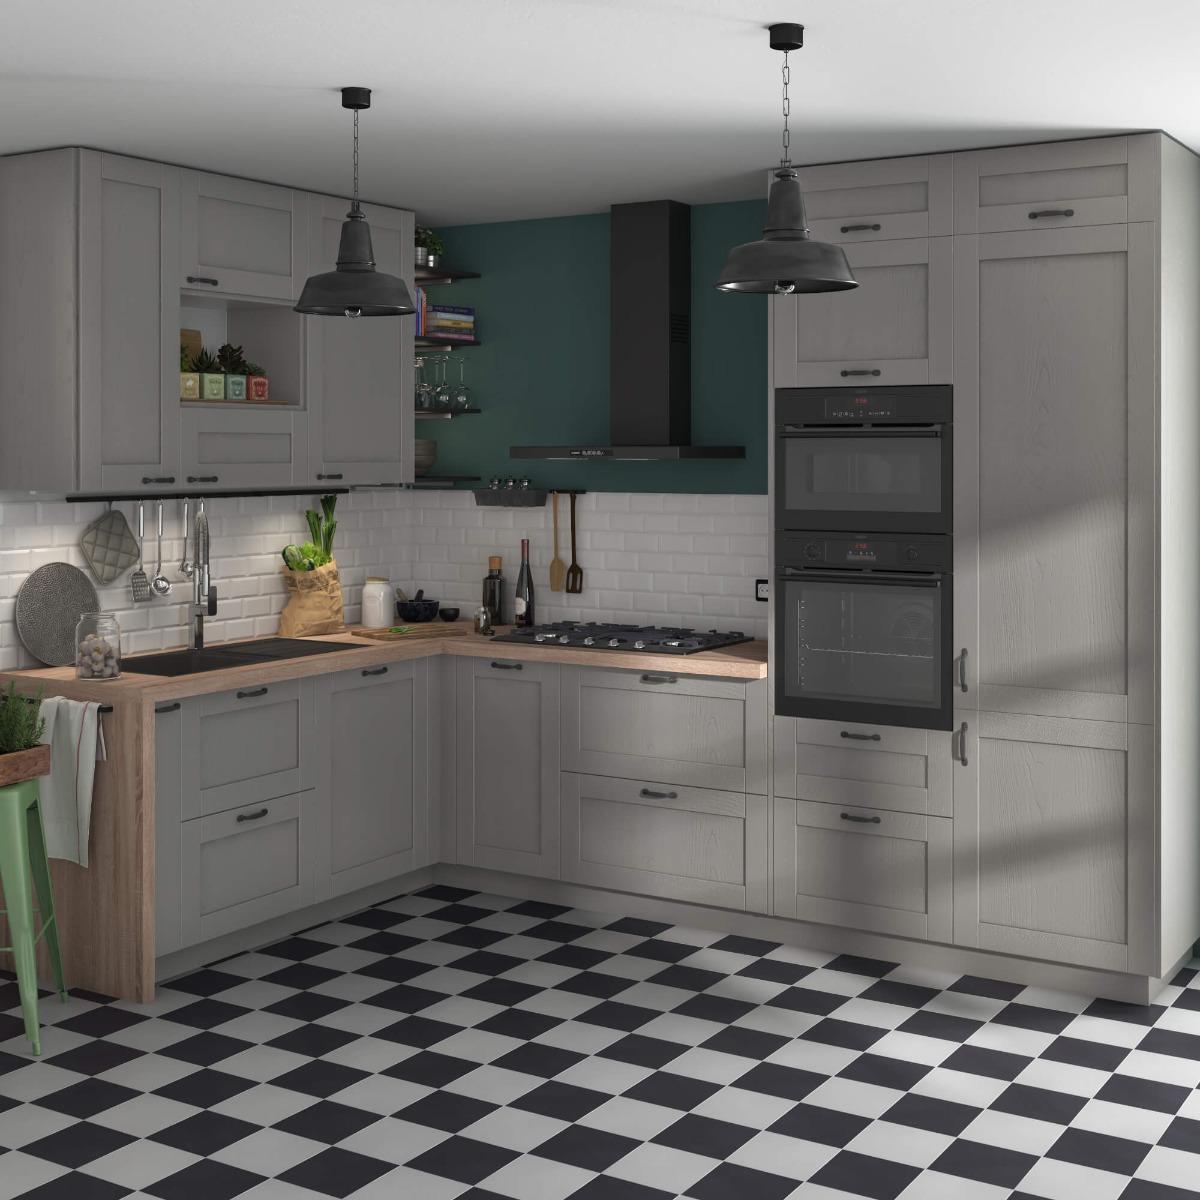 Delinia Boston Designer Kitchen By Leroy Merlin Leroy Merlin South Africa